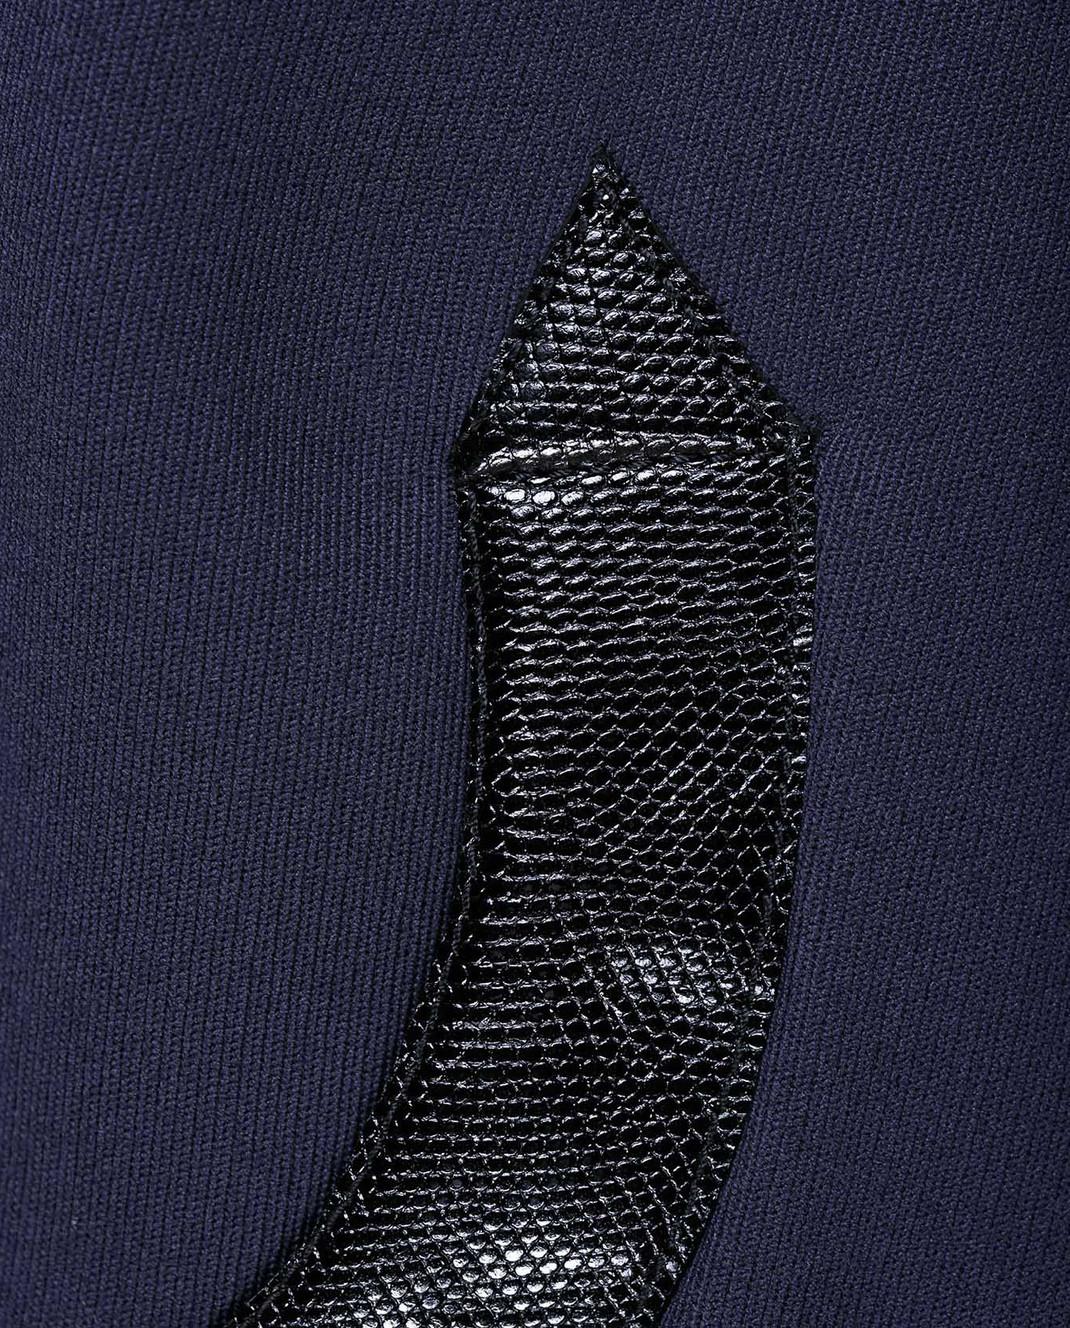 NINA RICCI Темно-синее пальто из шерсти 17HCMA016WV0220 изображение 5